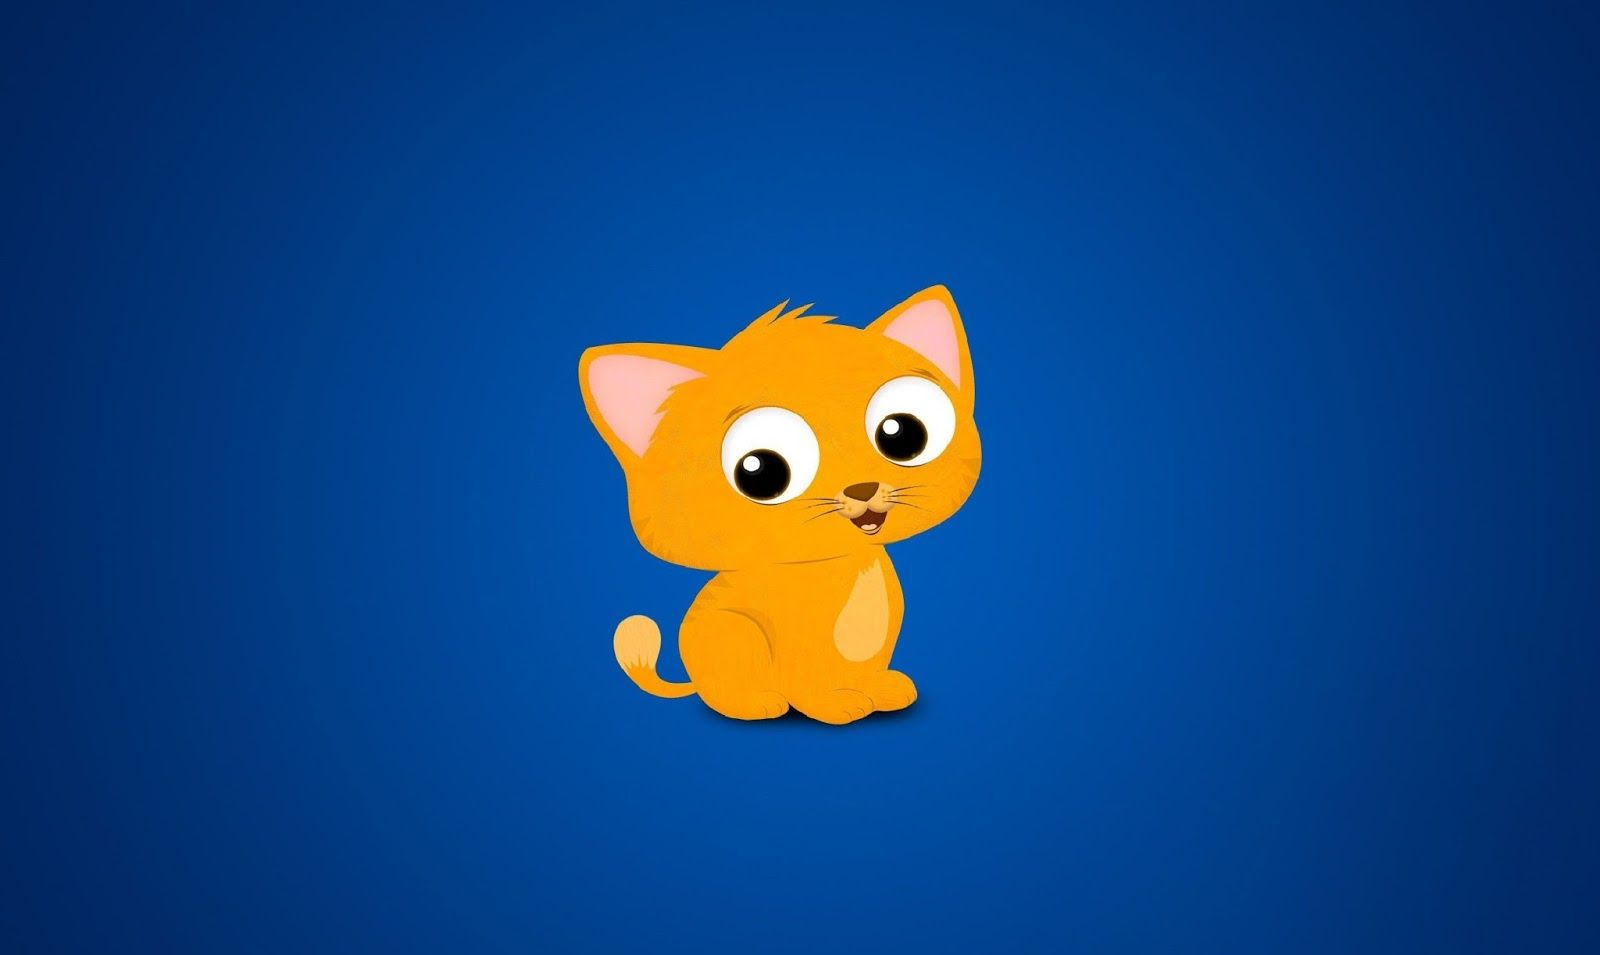 860 Gambar Kartun Lucu Imut Hd Terbaik Wallpaper Lucu Cute Kittens Anak Anjing